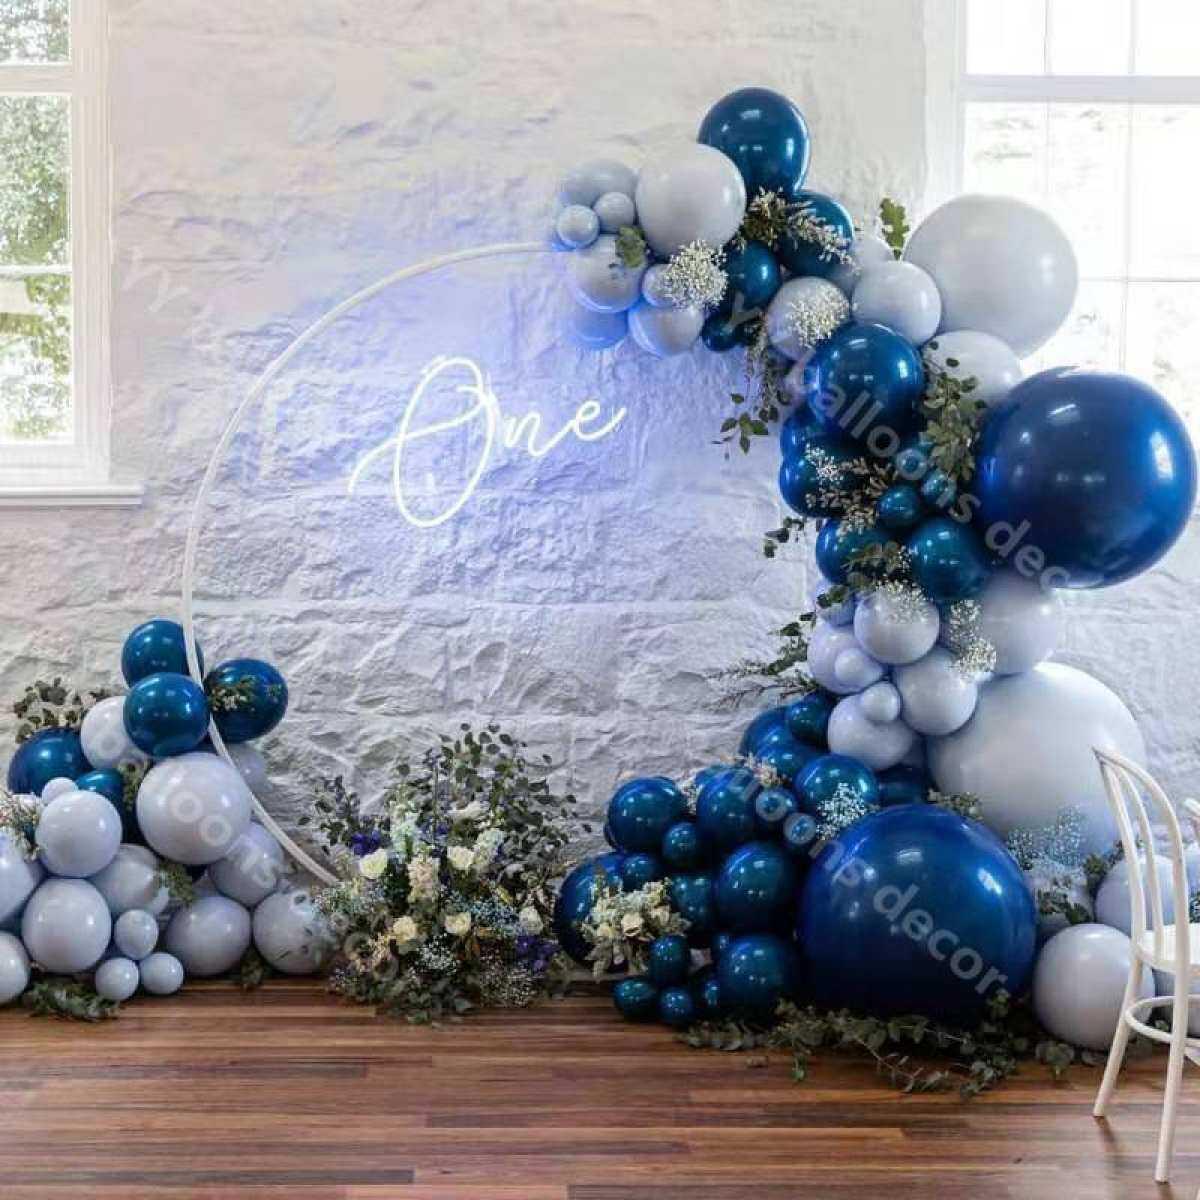 114pcs Macaron Blue Balloon Garland Arch Kit Navy Blue Baby Wedding Shower 1st Happy Birthday Party Decoration Balloons Supplies Lazada